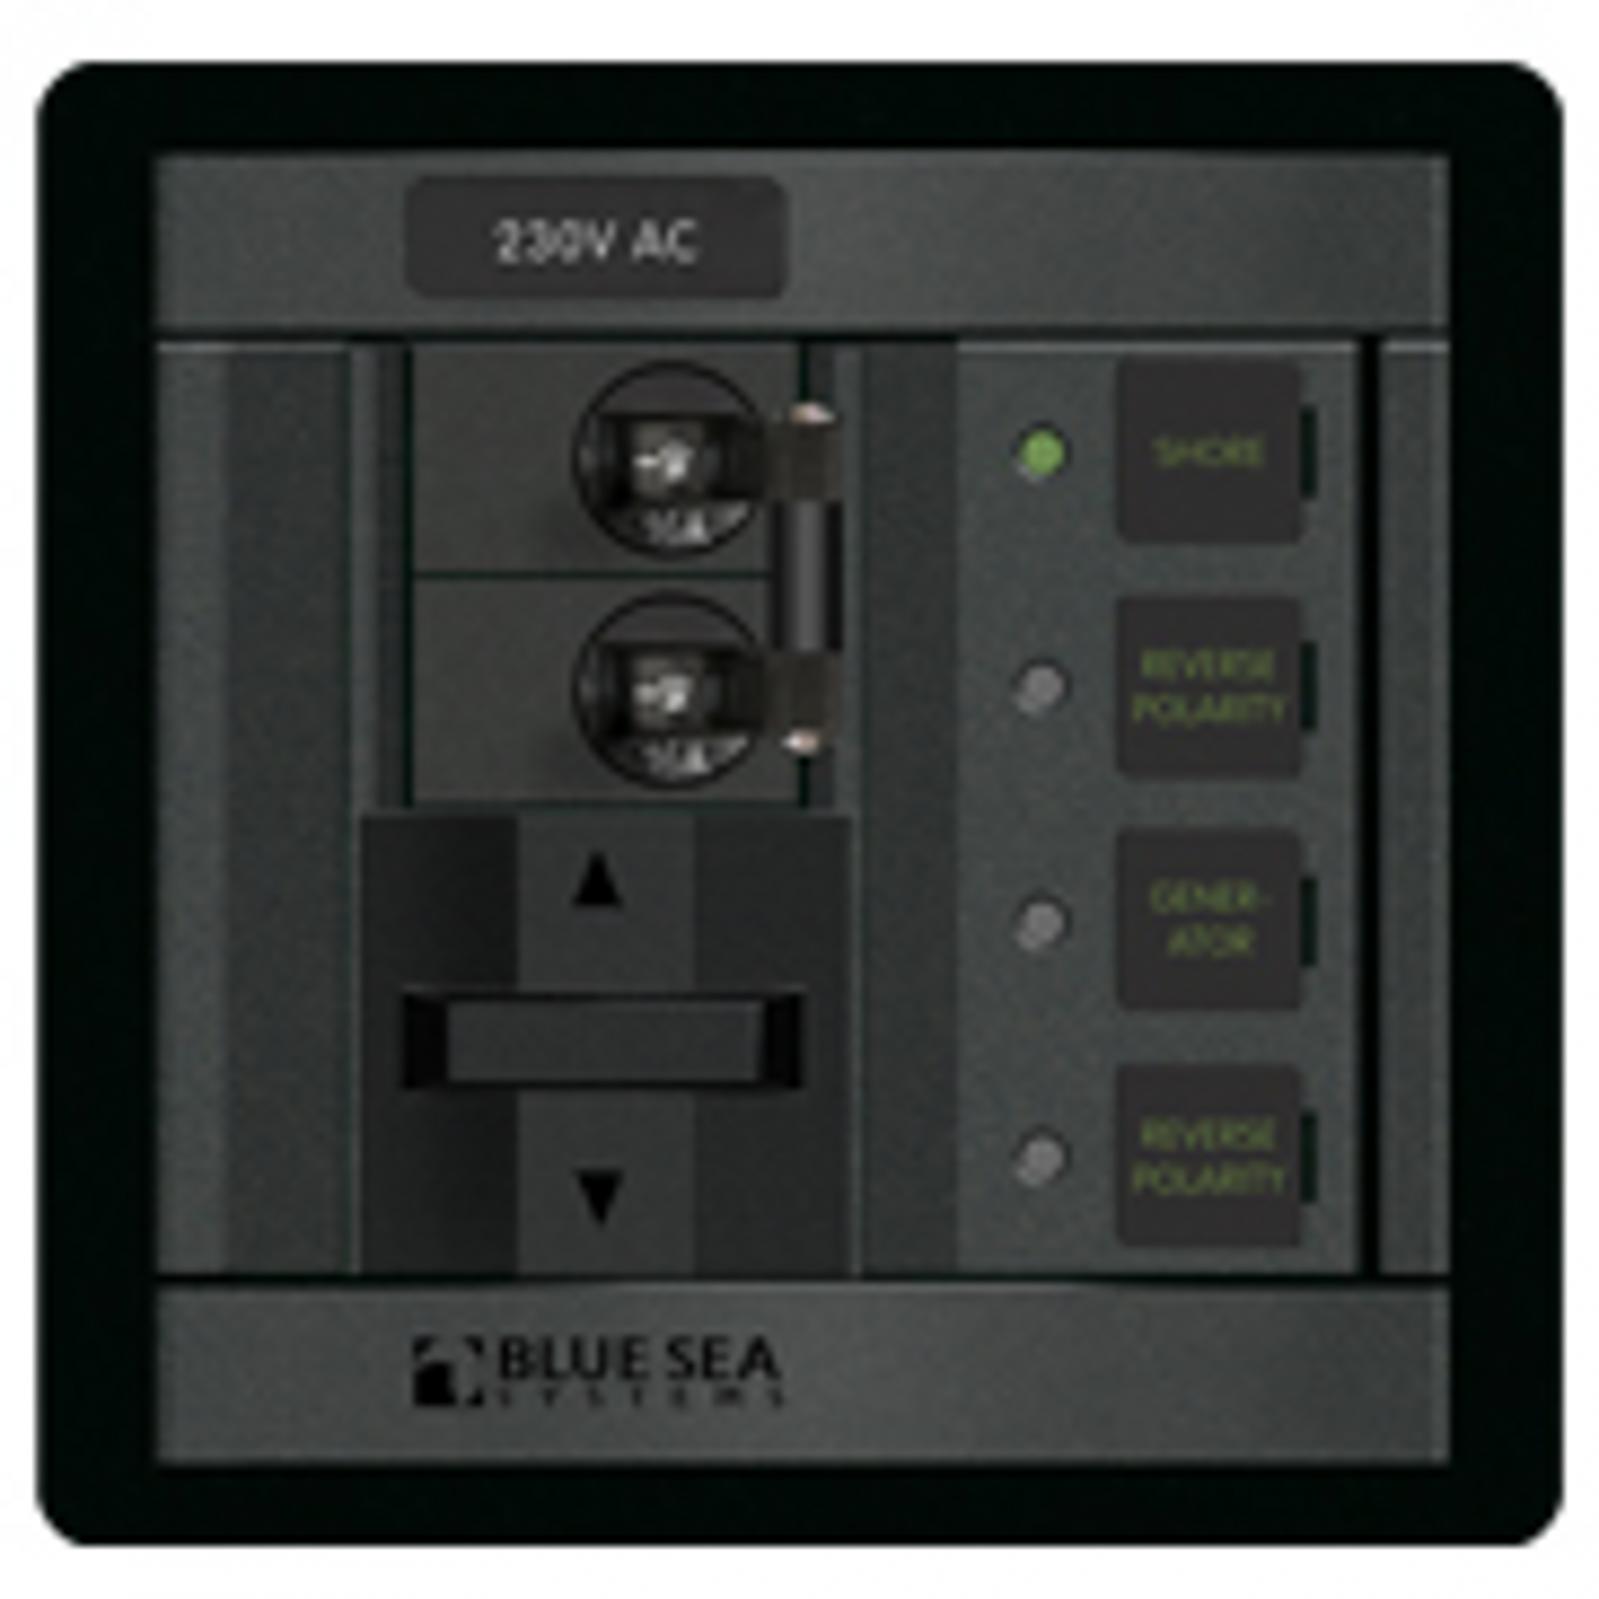 Click image for larger version  Name:BlueSea 230 Volt AC 2 Sources.png Views:101 Size:1.35 MB ID:8677